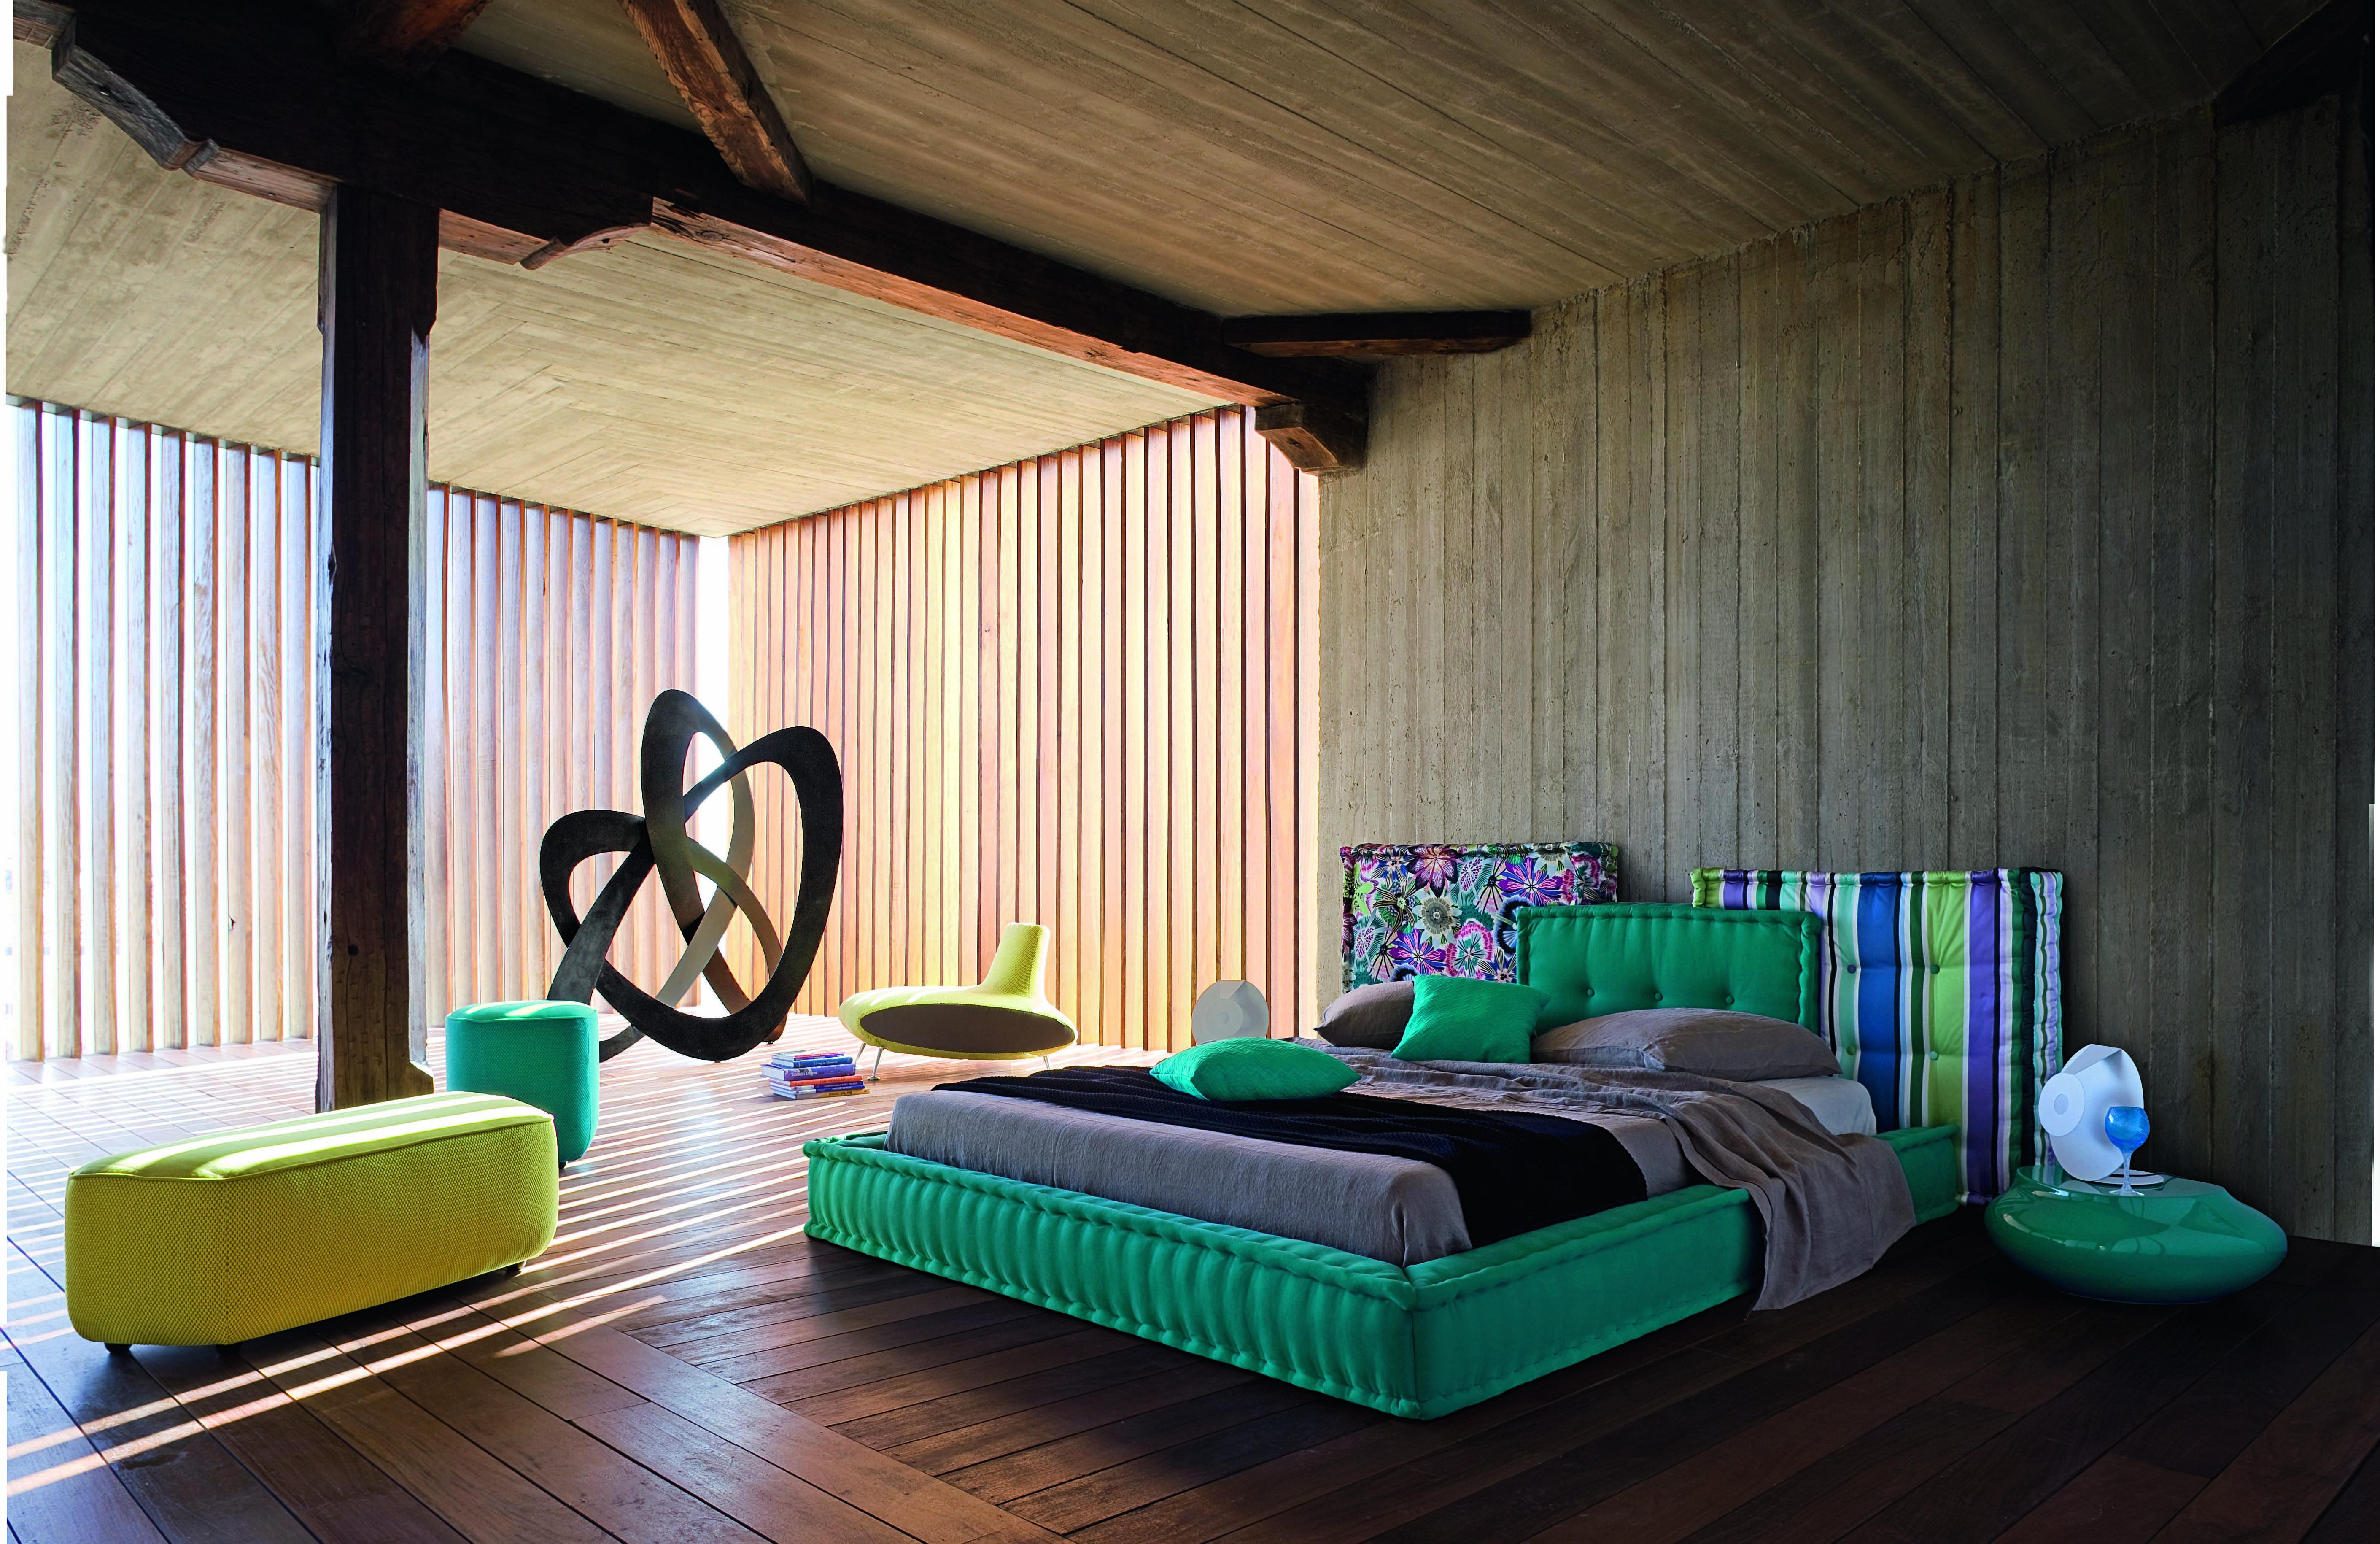 Roche Bobois Mah Jong Bed Design Marco Fumagalli Mahjong Bed Rochebobois Modern Patio Furniture Bedroom Design Interior Design Rustic